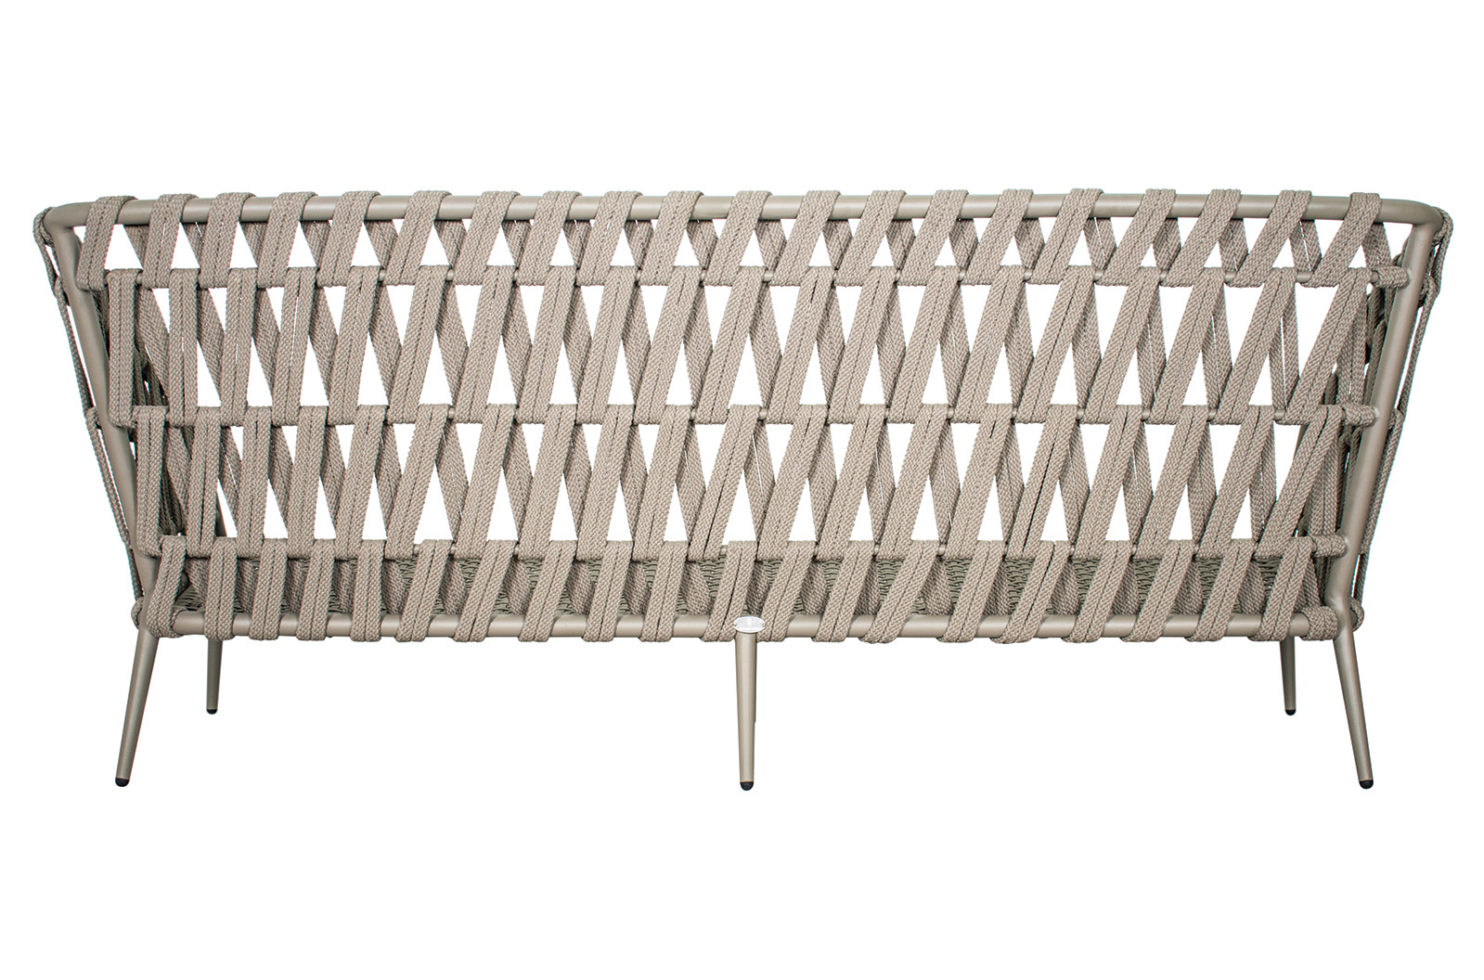 Archipelago andaman sofa 620FT066P2LGT frame 1 back